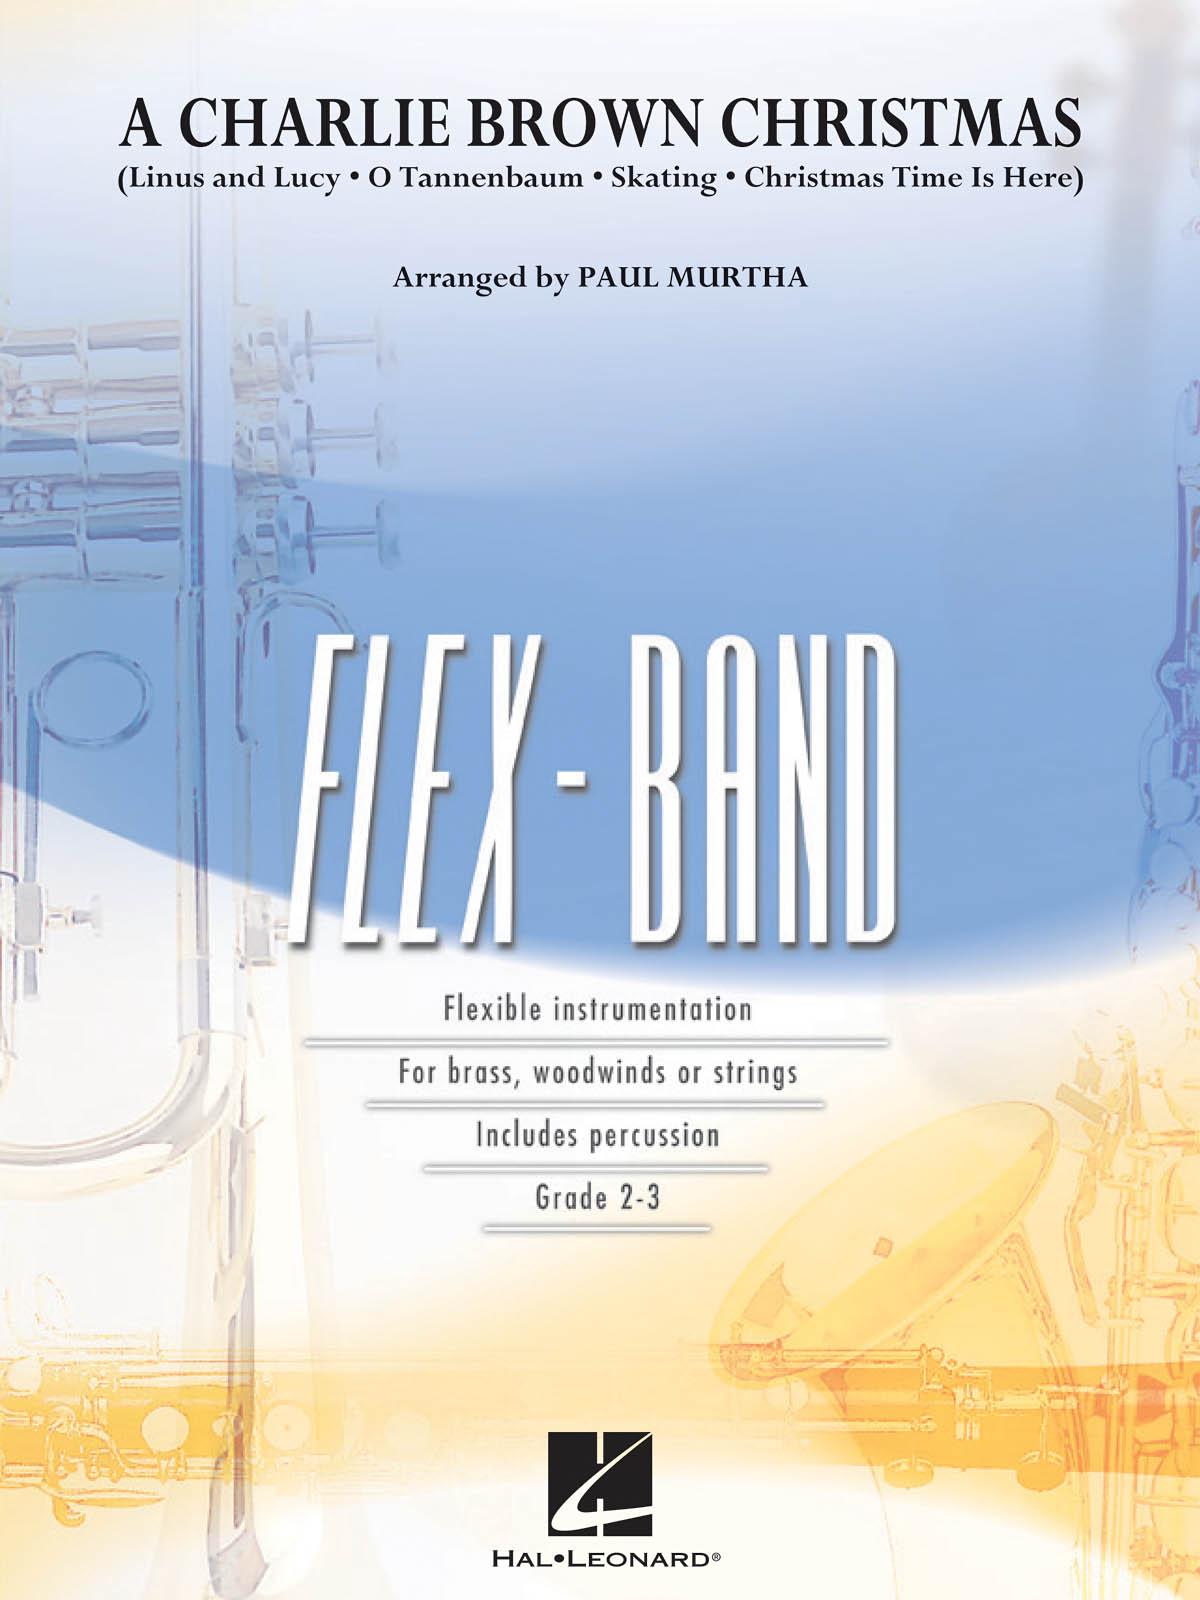 Vince Guaraldi: A Charlie Brown Christmas: Concert Band: Score & Parts